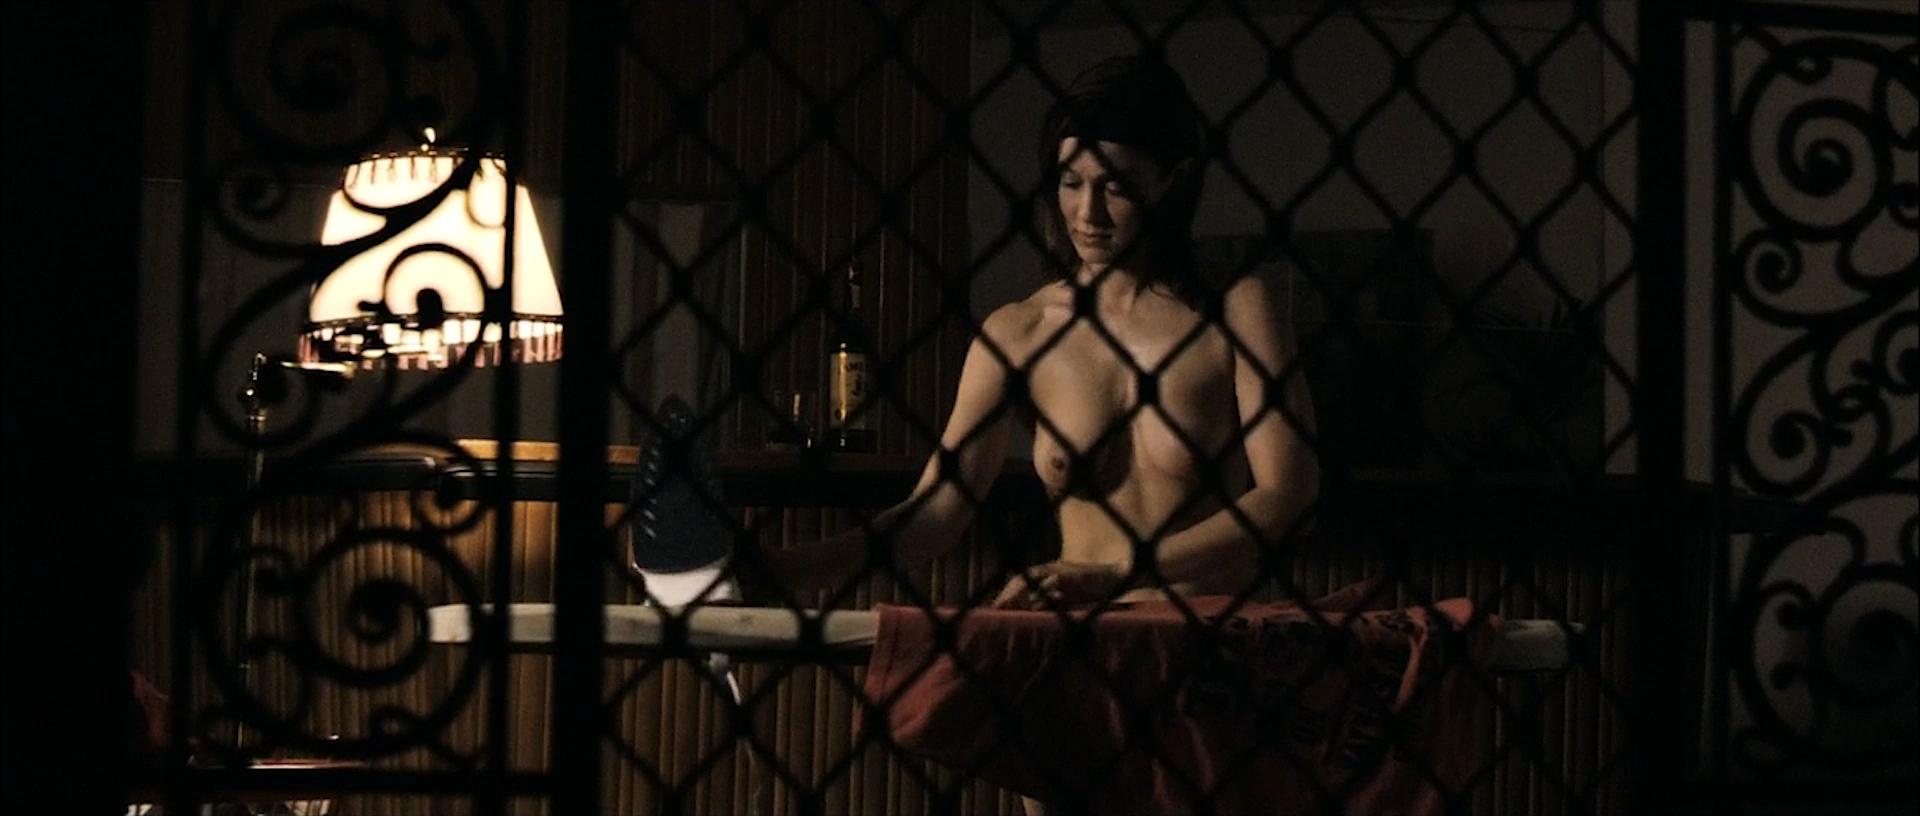 Tahyna Tozzi hot and wet and Kristi-Lee Kalendra nude topless - Beautiful (AU-2009) 1080p BluRay (4)